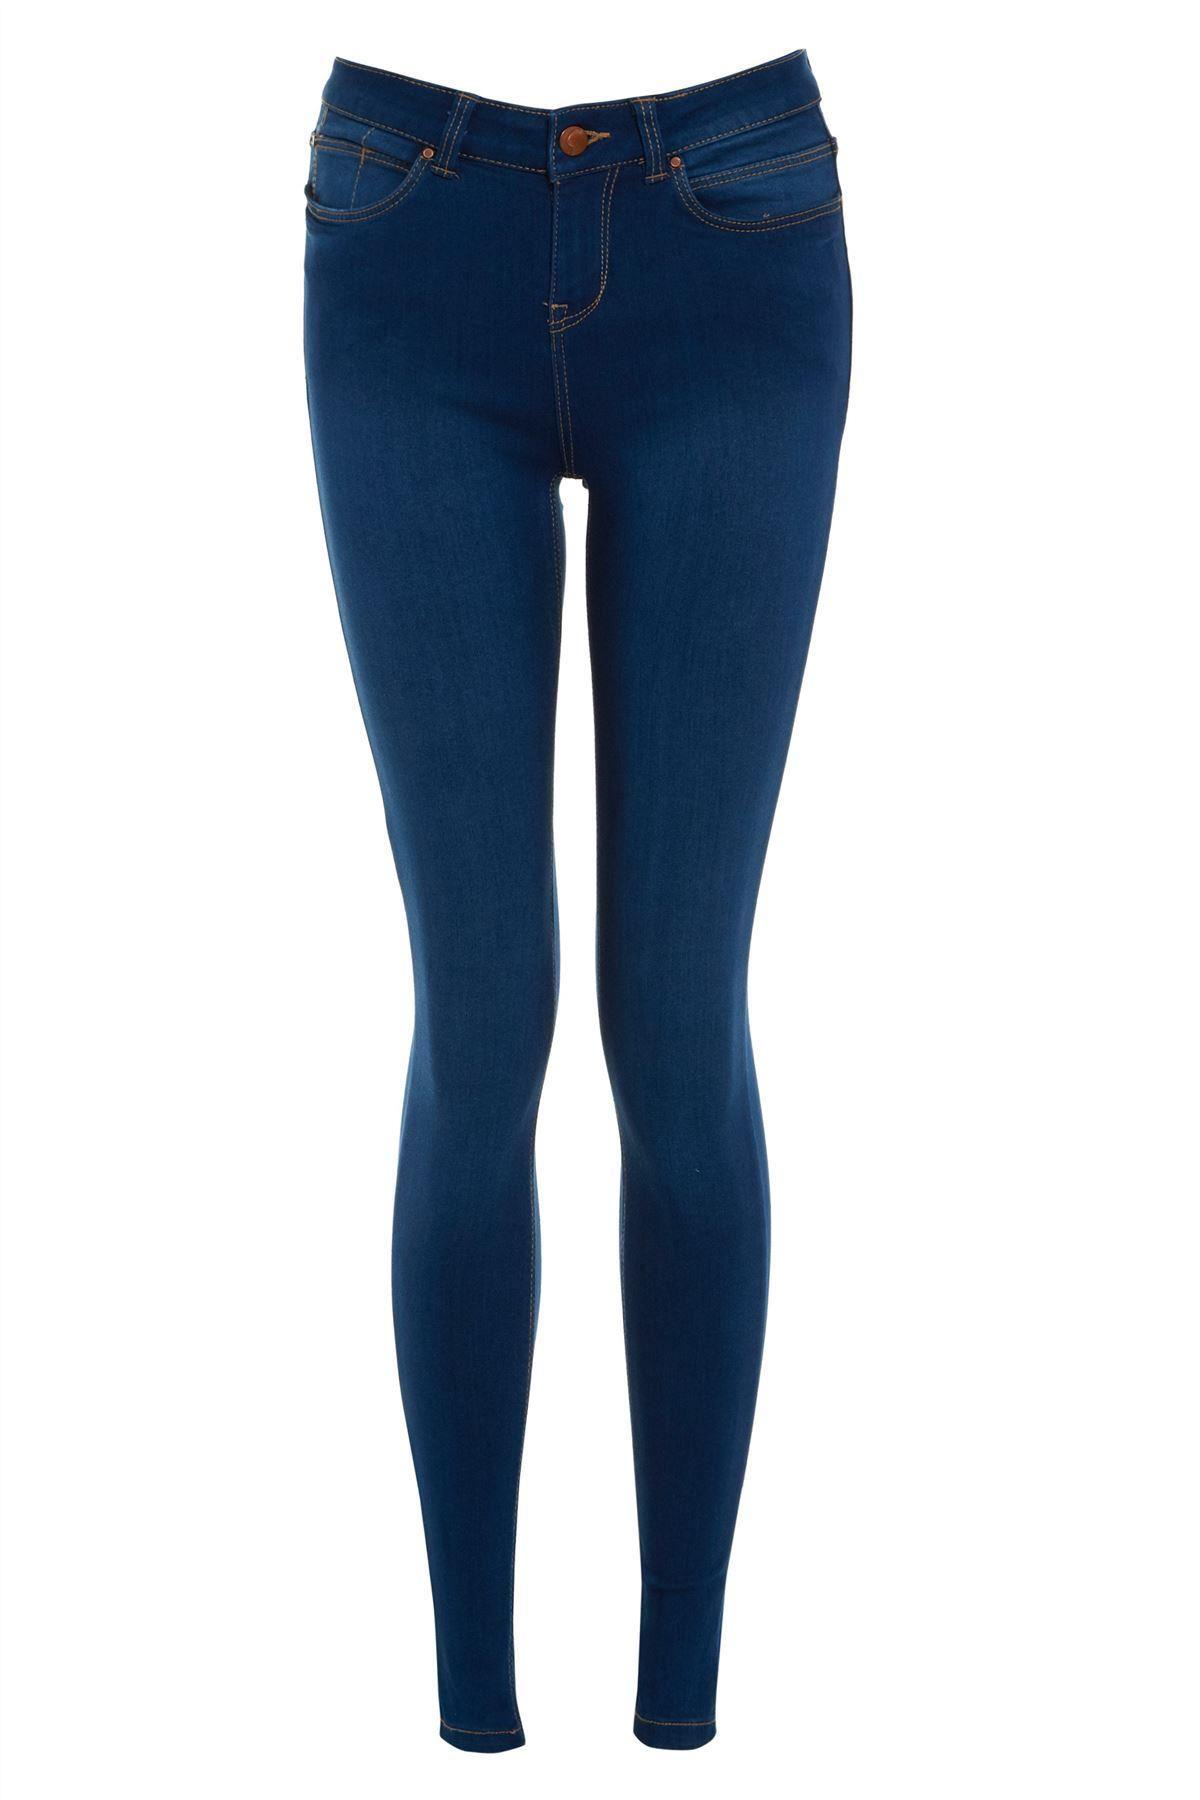 new look women 39 s navy blue casual super skinny jeans ebay. Black Bedroom Furniture Sets. Home Design Ideas